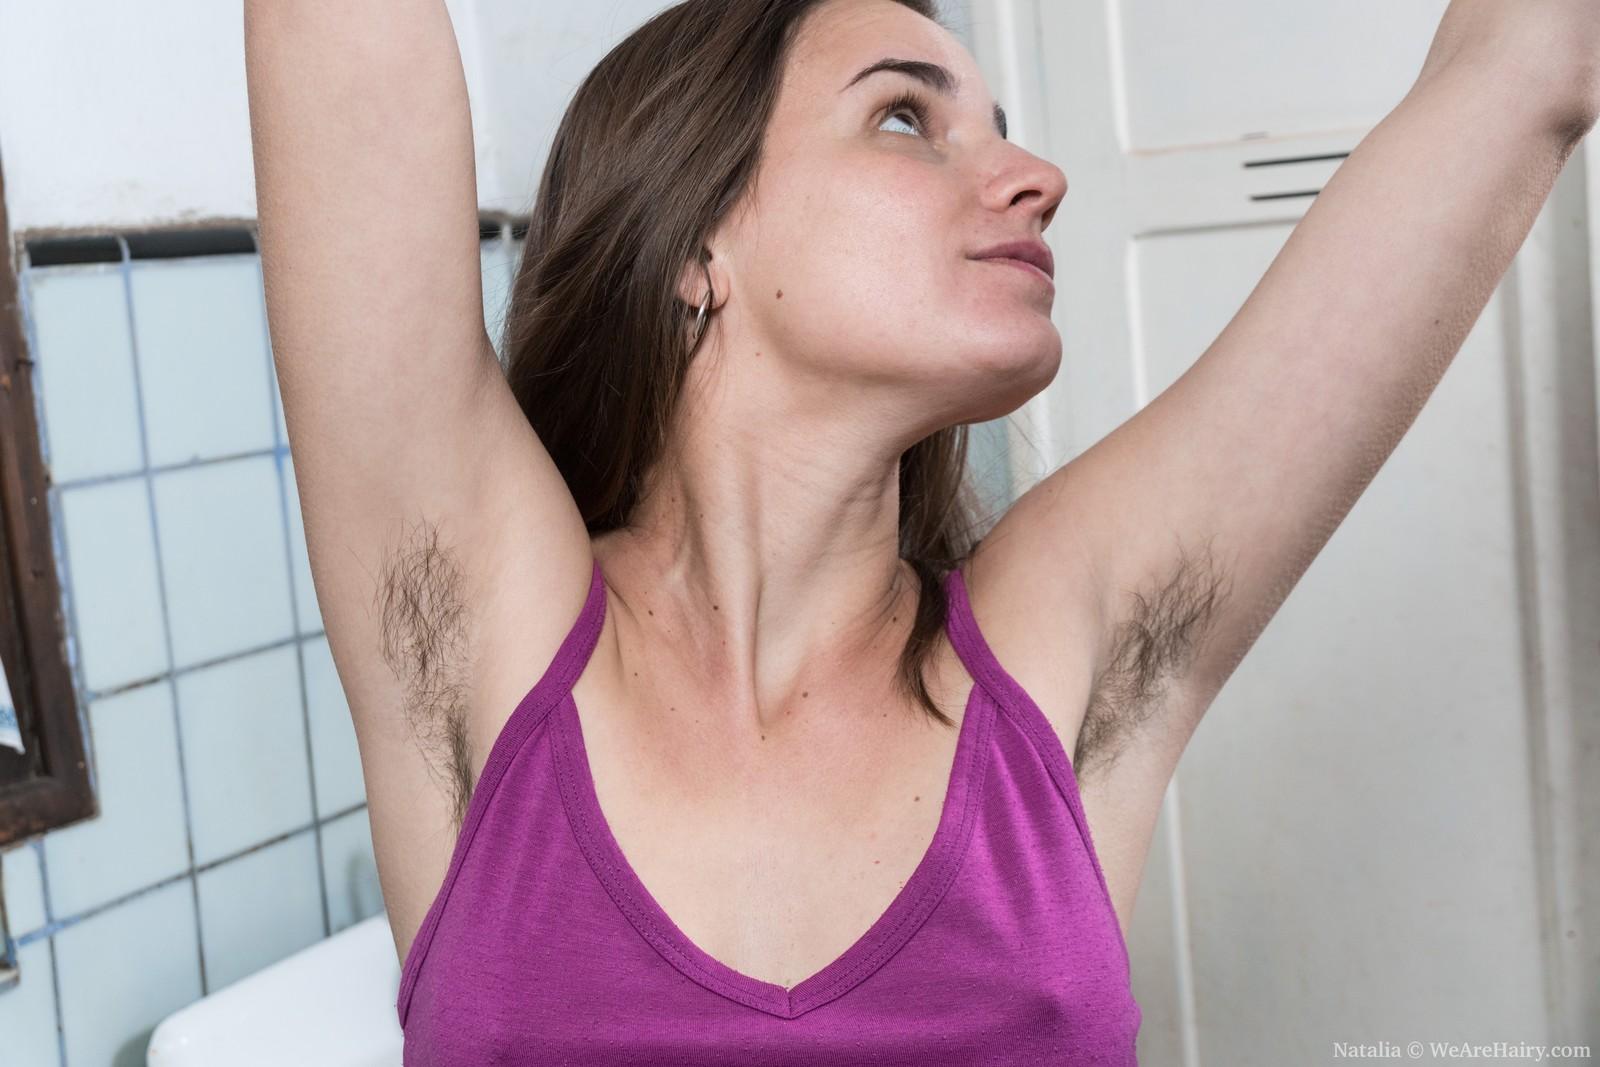 Kris french bukkake sperm